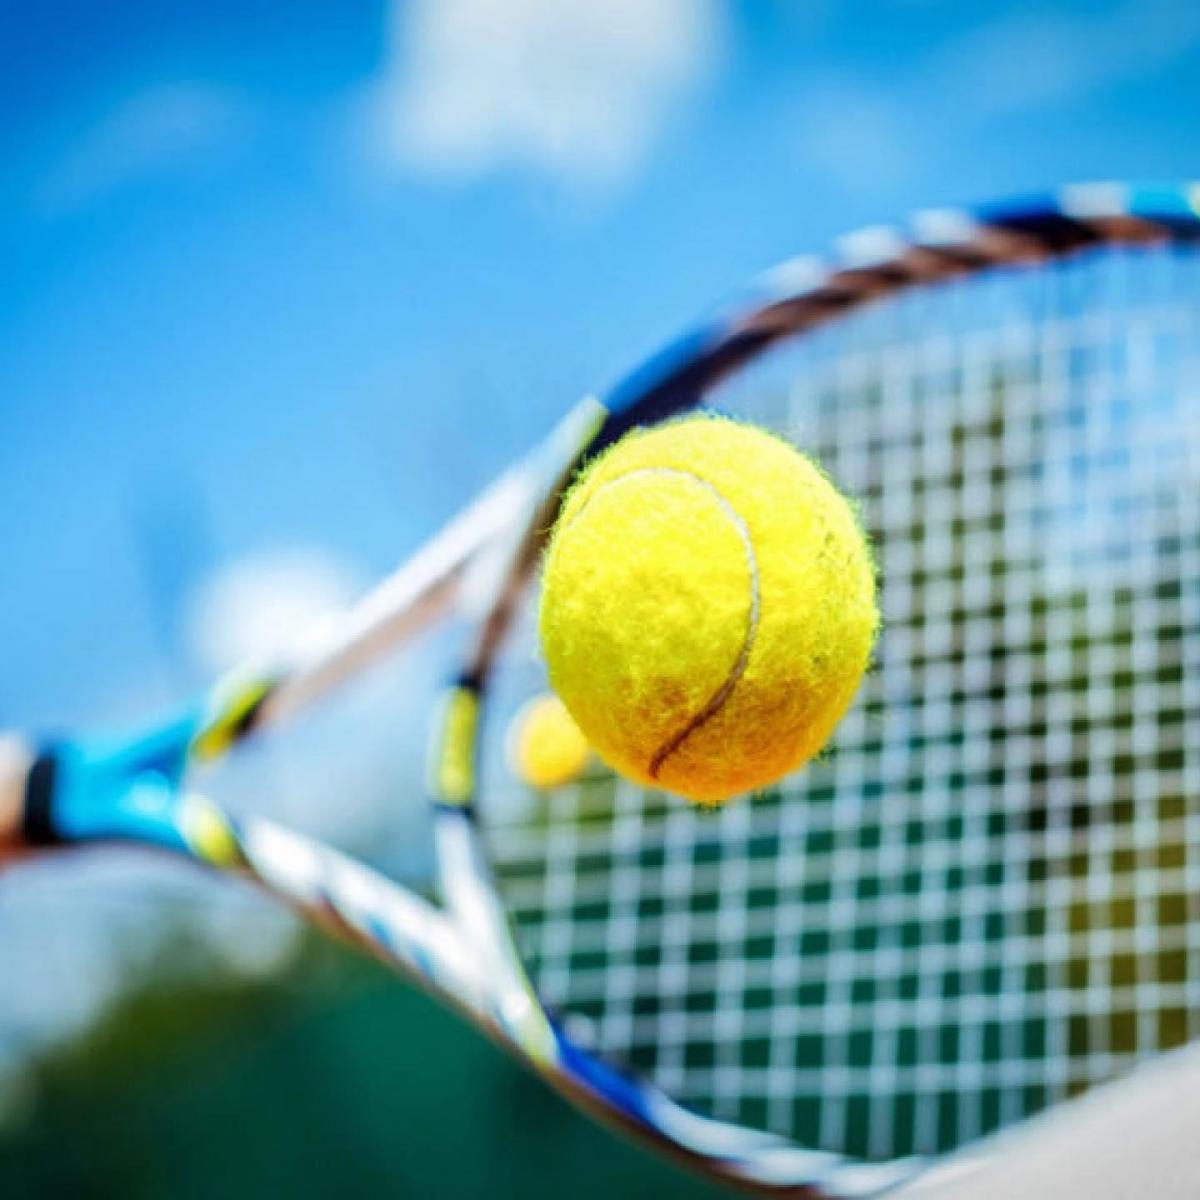 Tennis Santa Caterina Valfurva